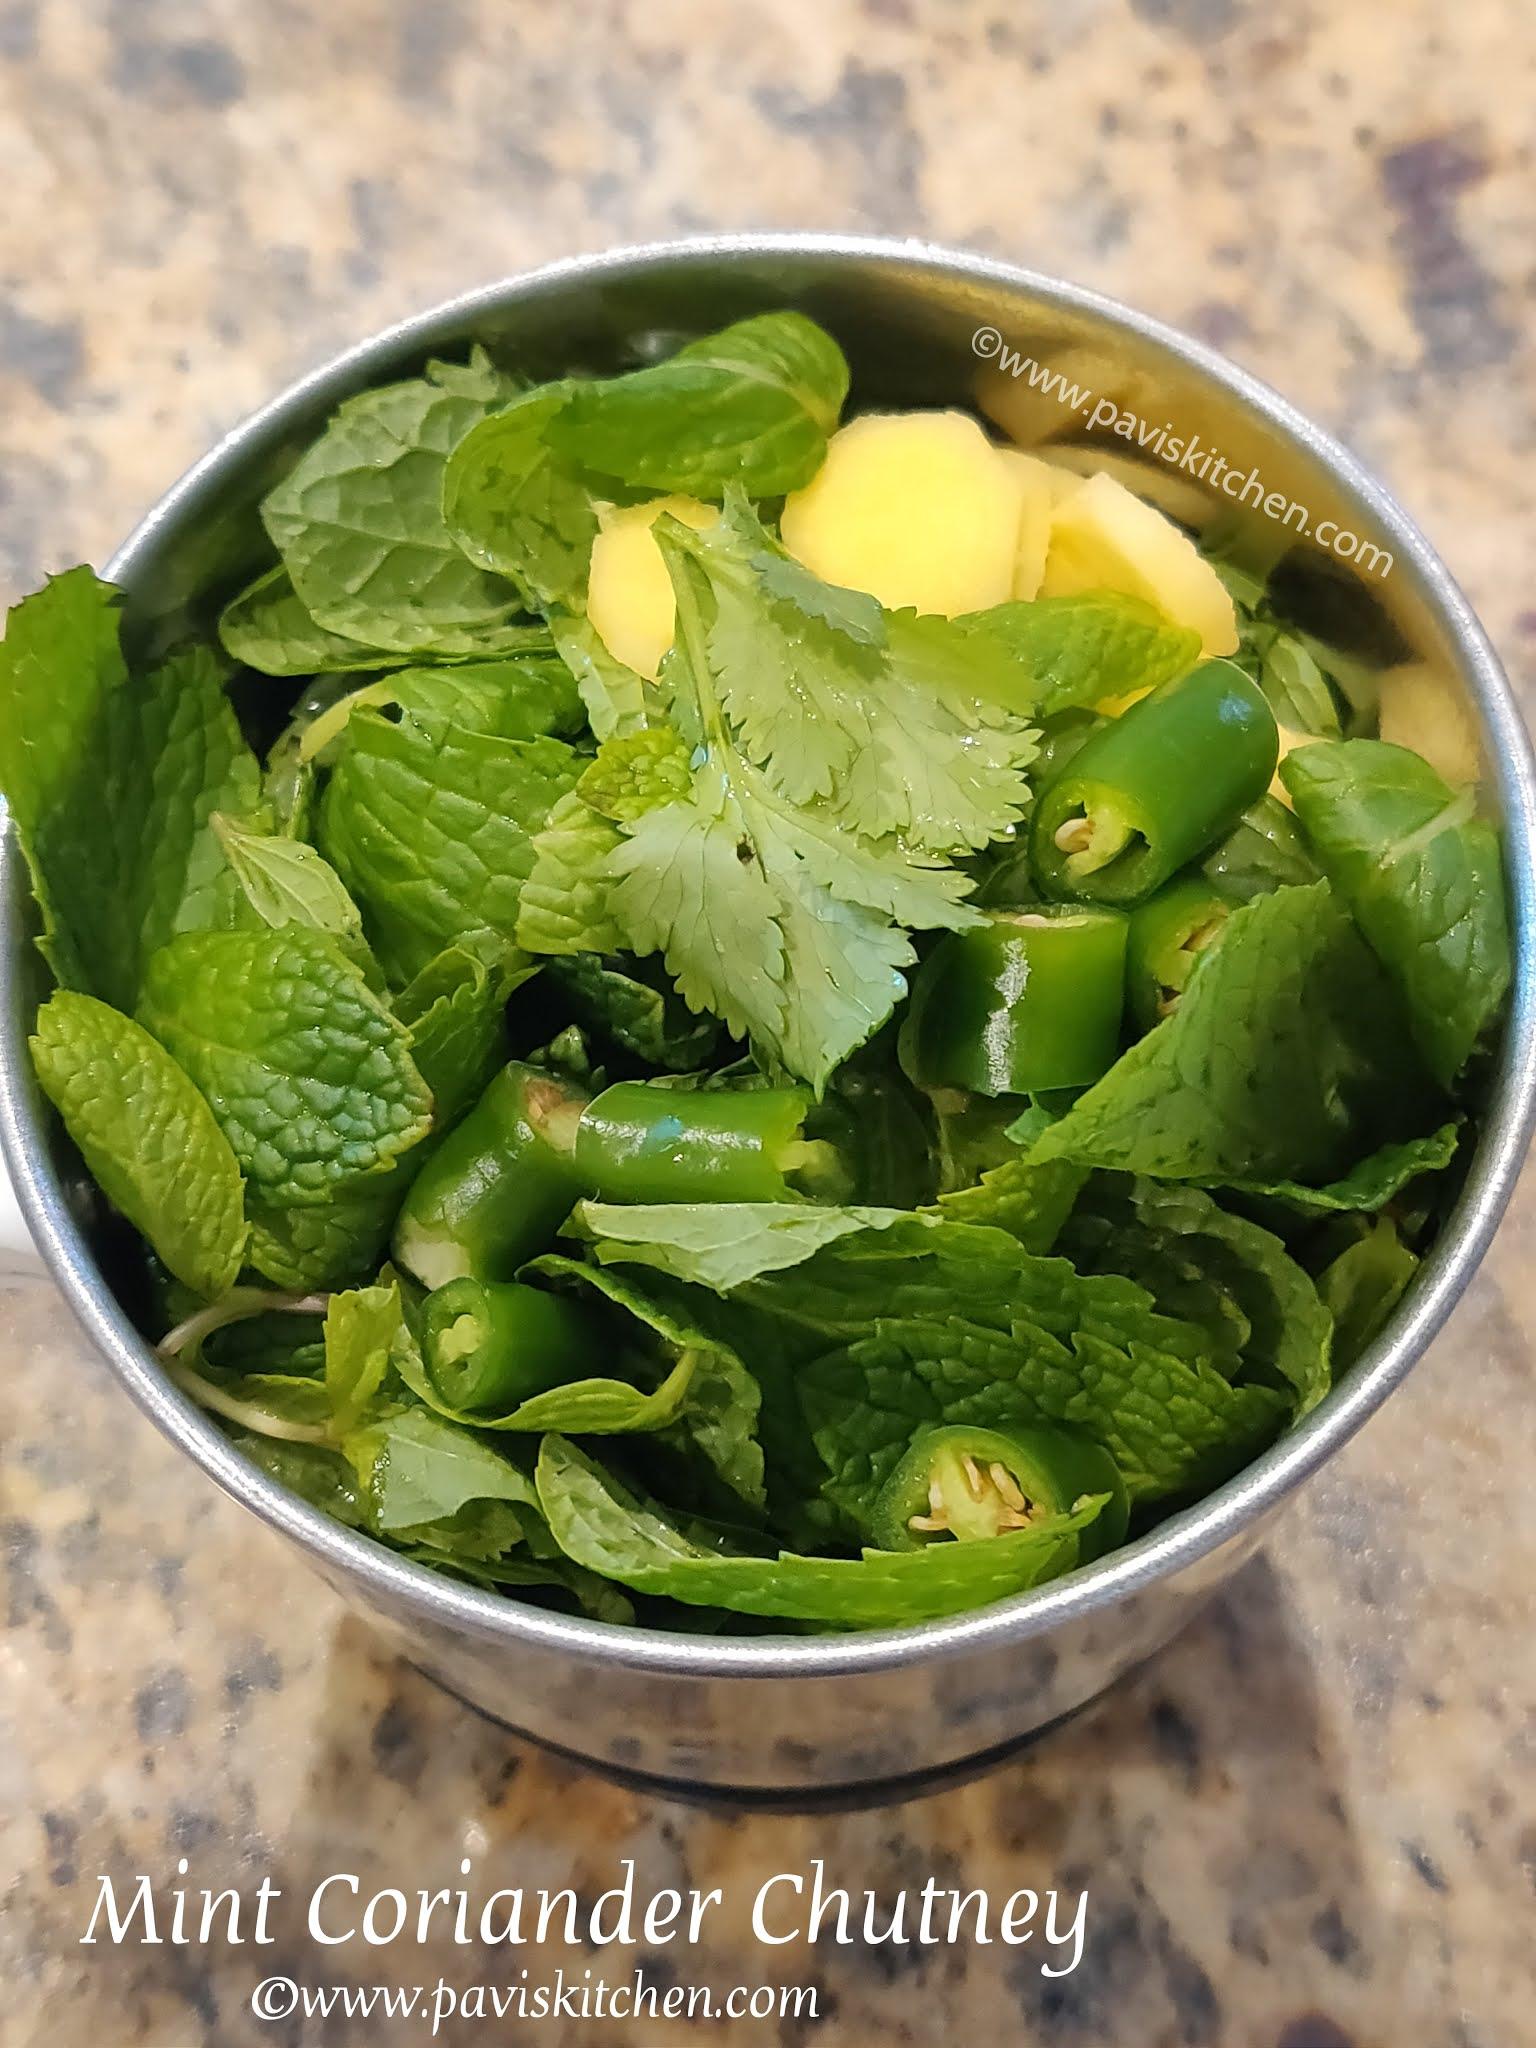 Mint coriander chutney recipe | Green chutney recipe for sandwich | Cilantro mint chutney recipe